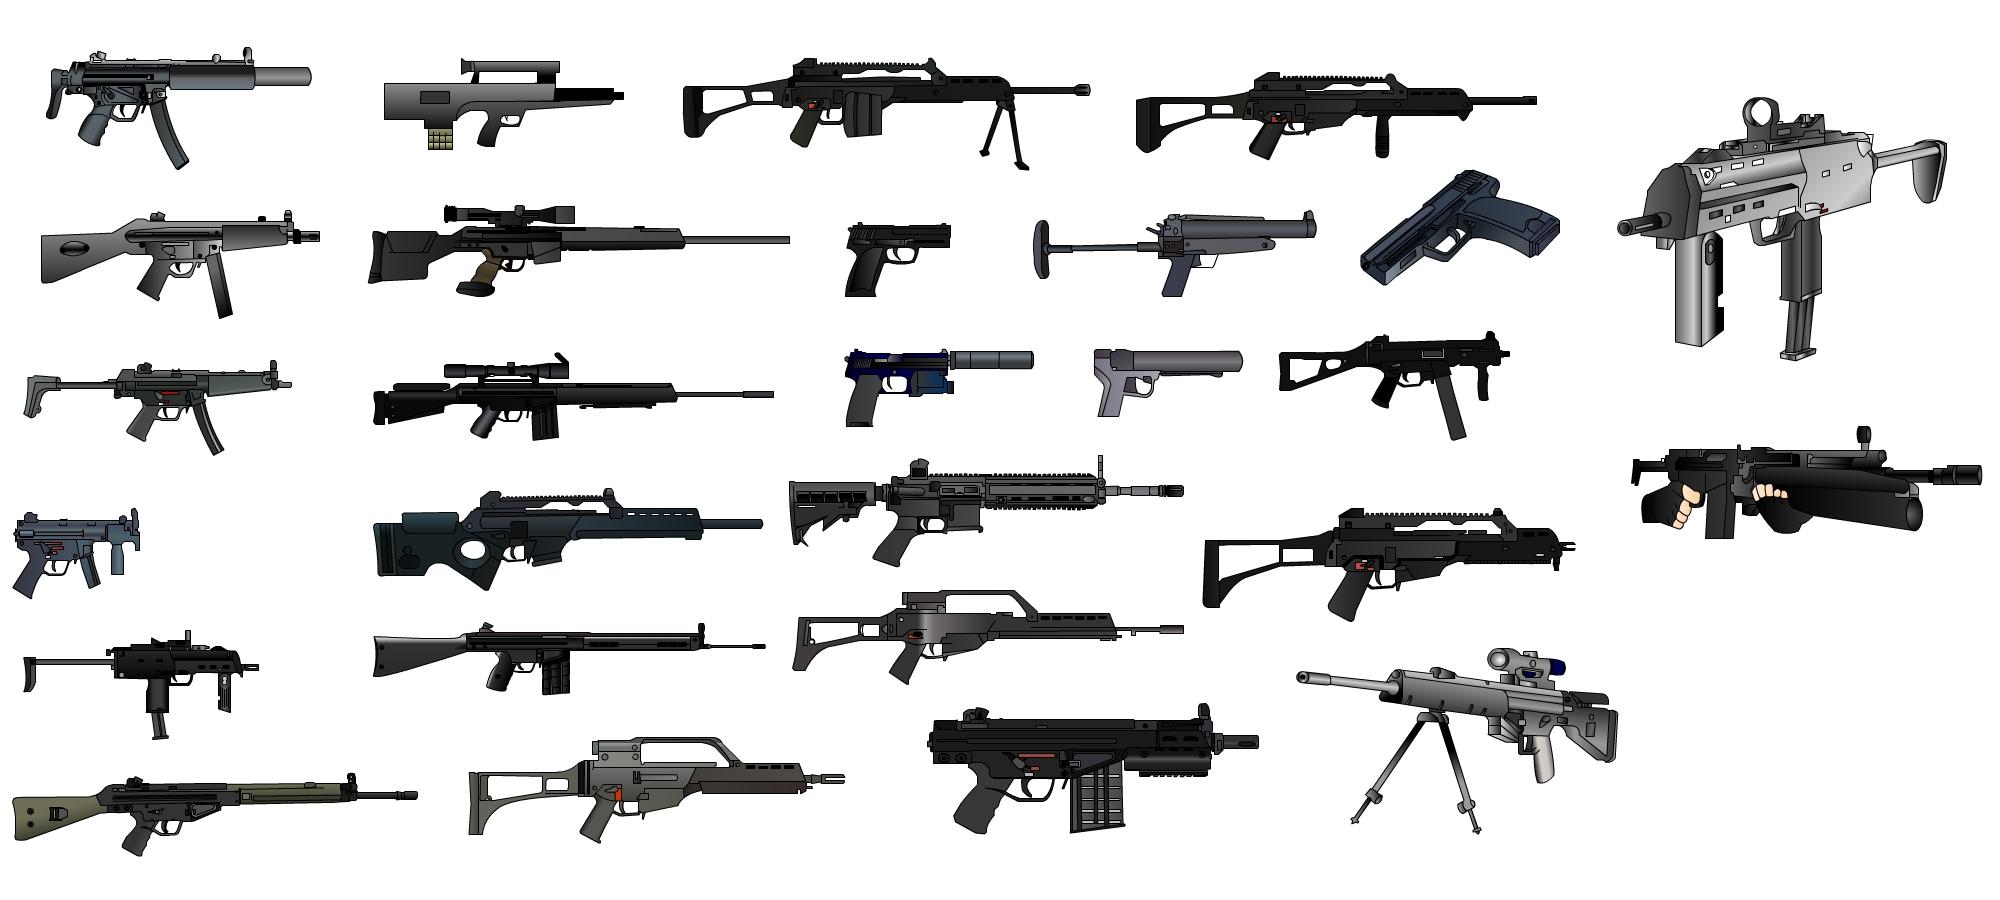 (http://hill-kleerup.org/blog/wp/wp-content/uploads/2012/12/HK_guns_2_by_b1ohazard90uk1.jpg)